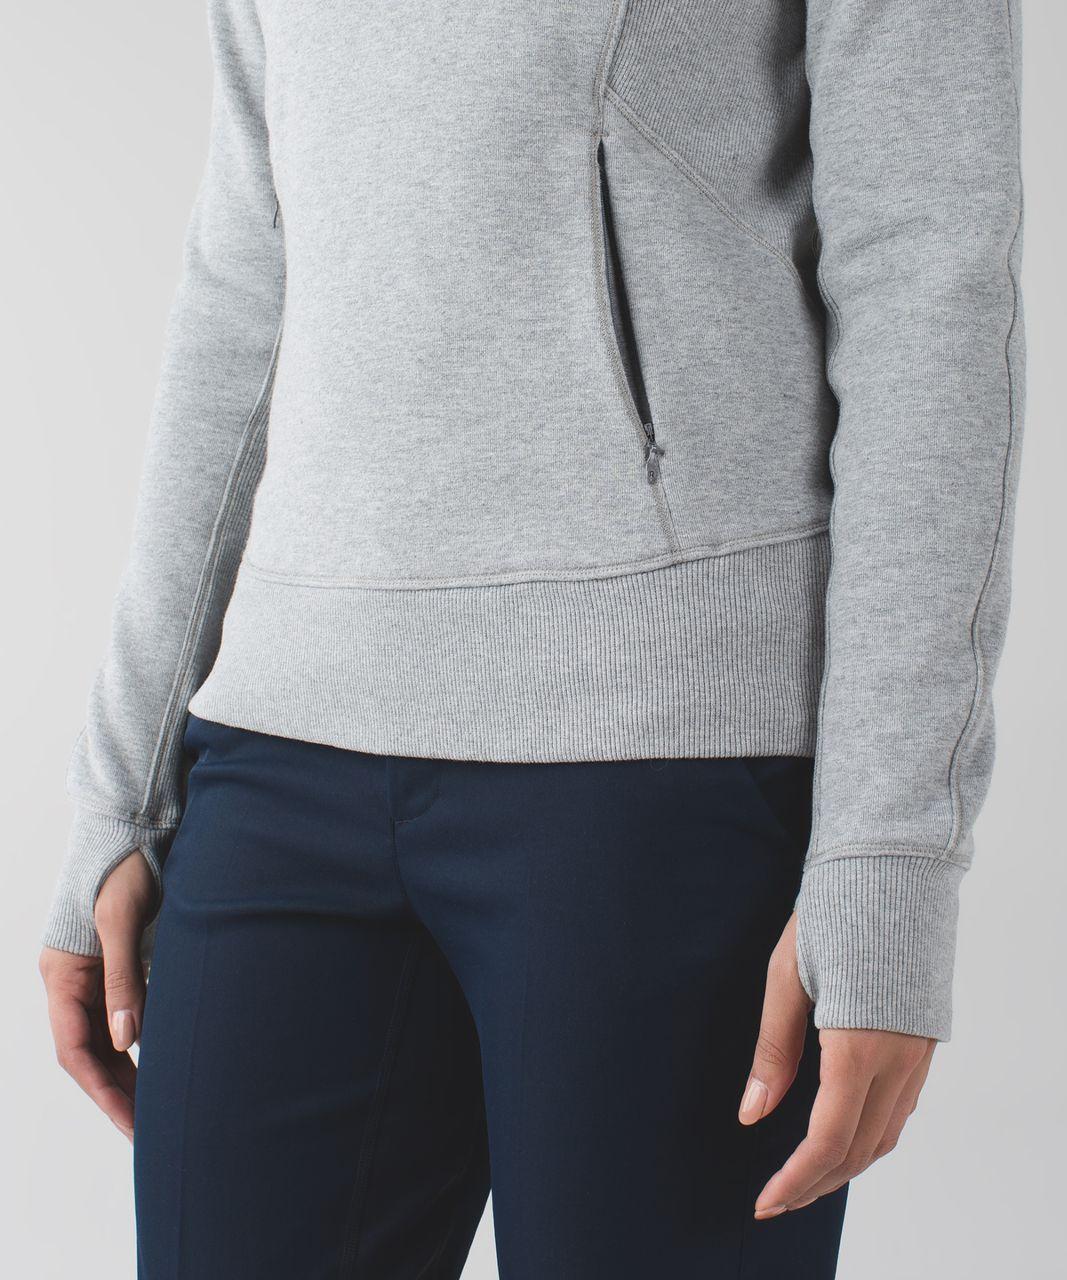 Lululemon Under Wraps Pullover - Heathered Medium Grey